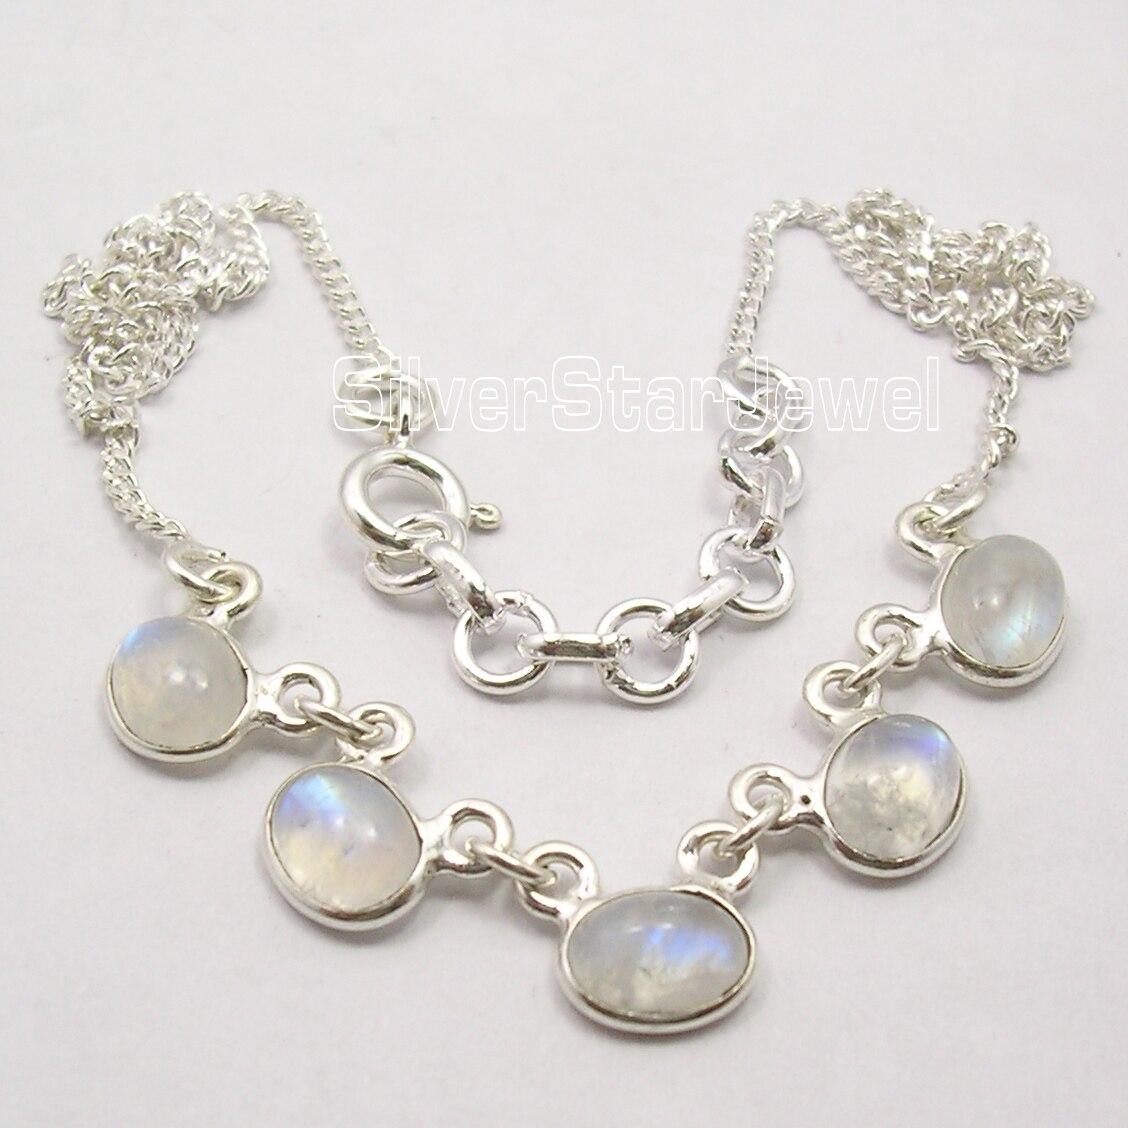 Chanti International SOLID Silver Original RAINBOW MOONSTONE Art LADIES Necklace 16 3/4 Inches